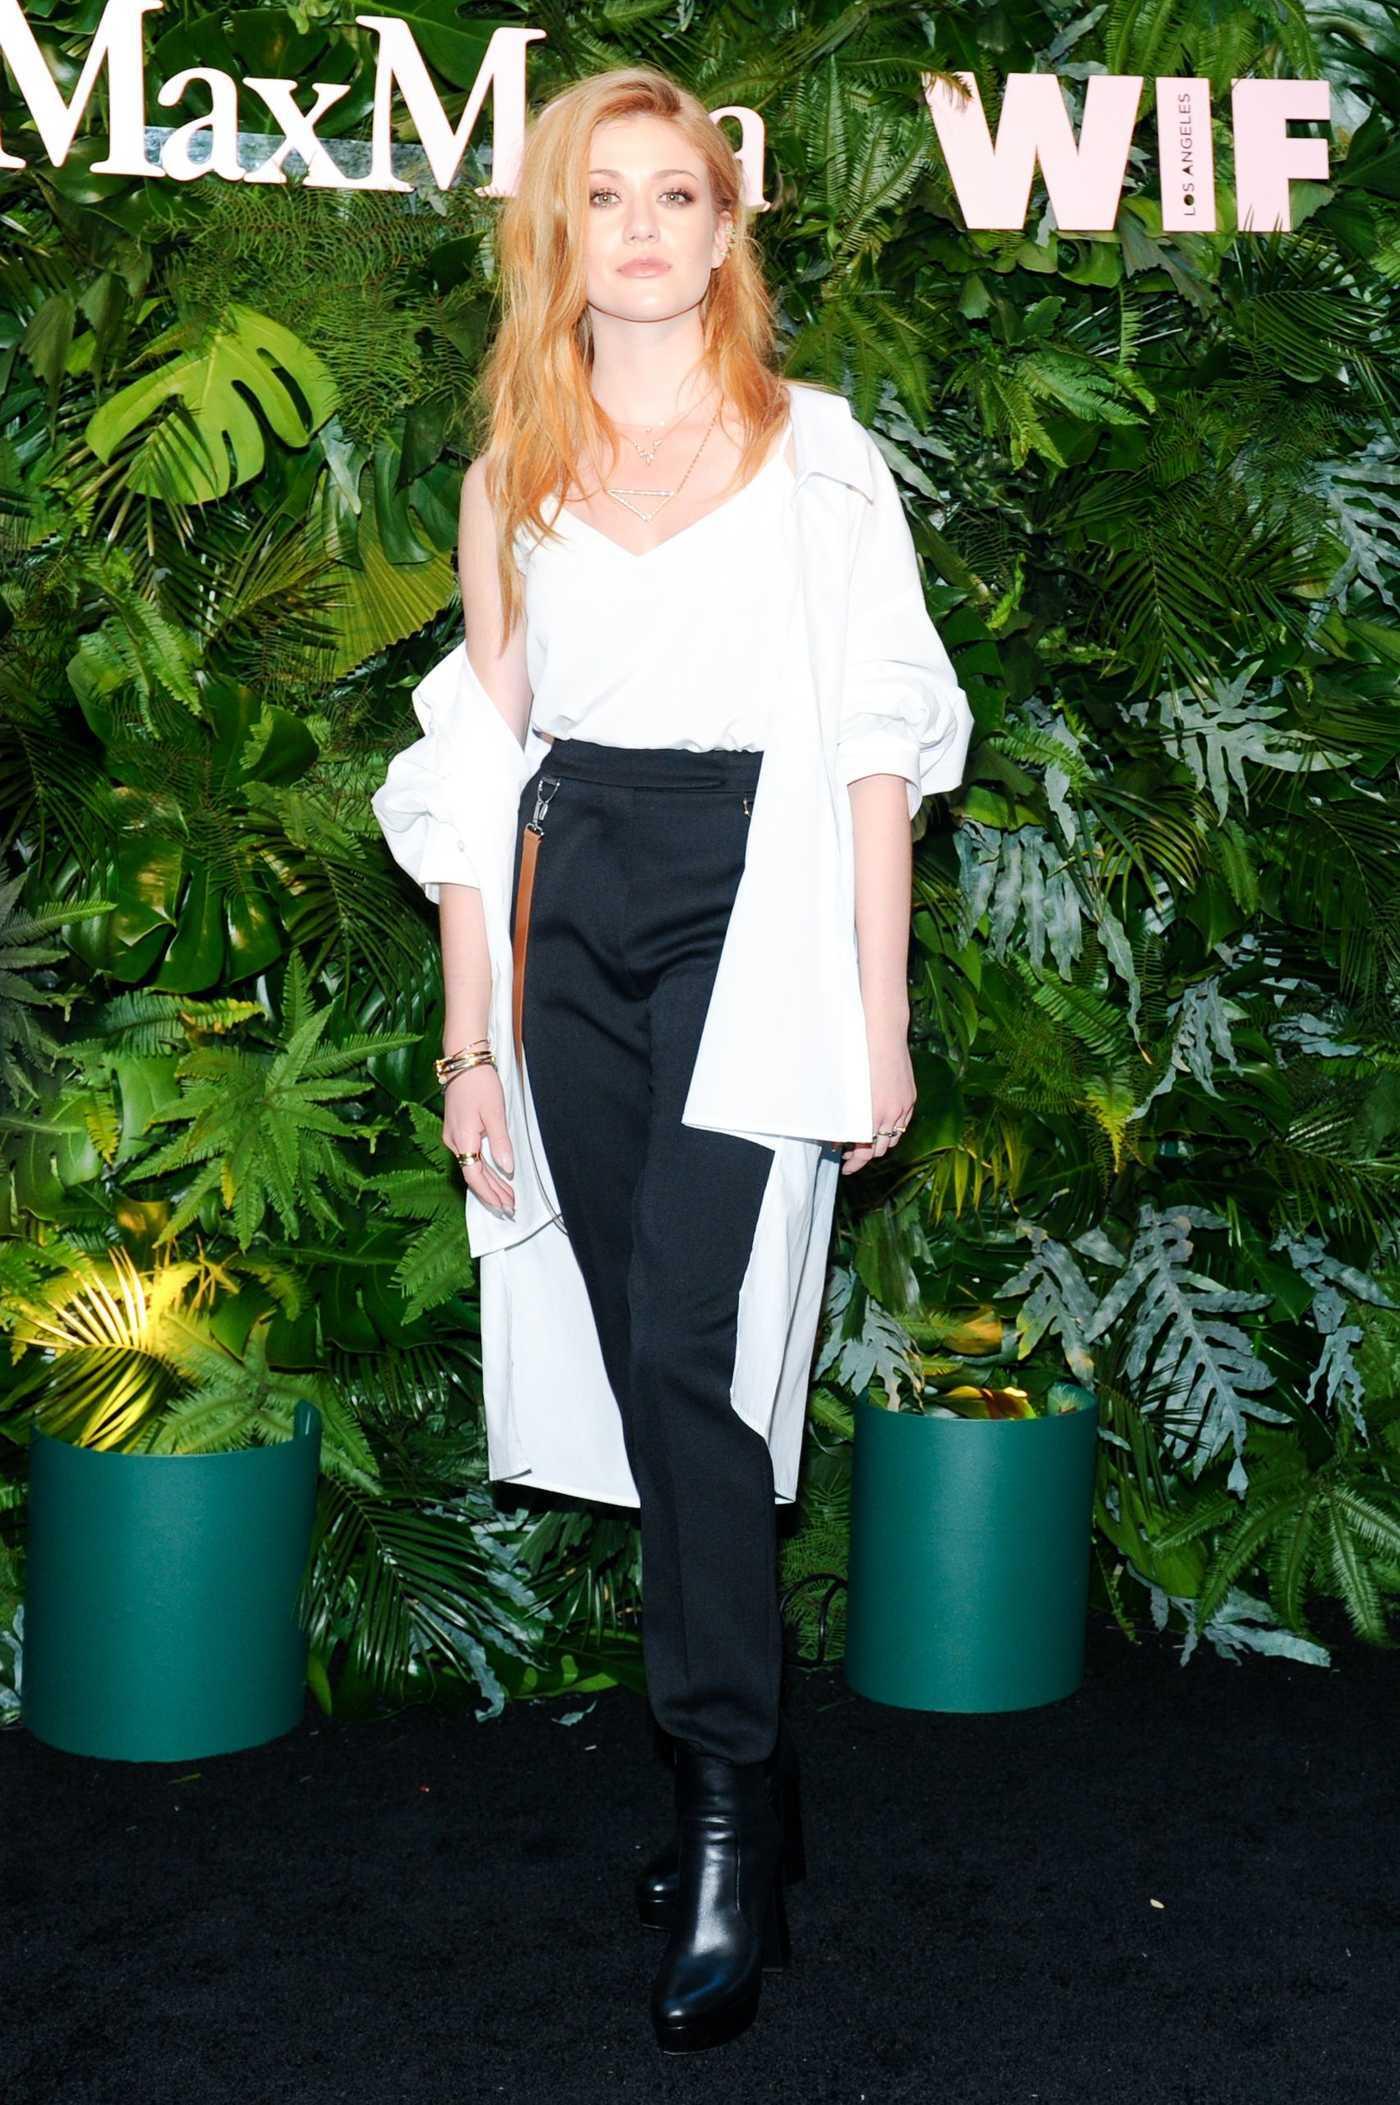 Katherine McNamara at 2018 MaxMara WIF Face of the Future in Los Angeles 06/12/2018